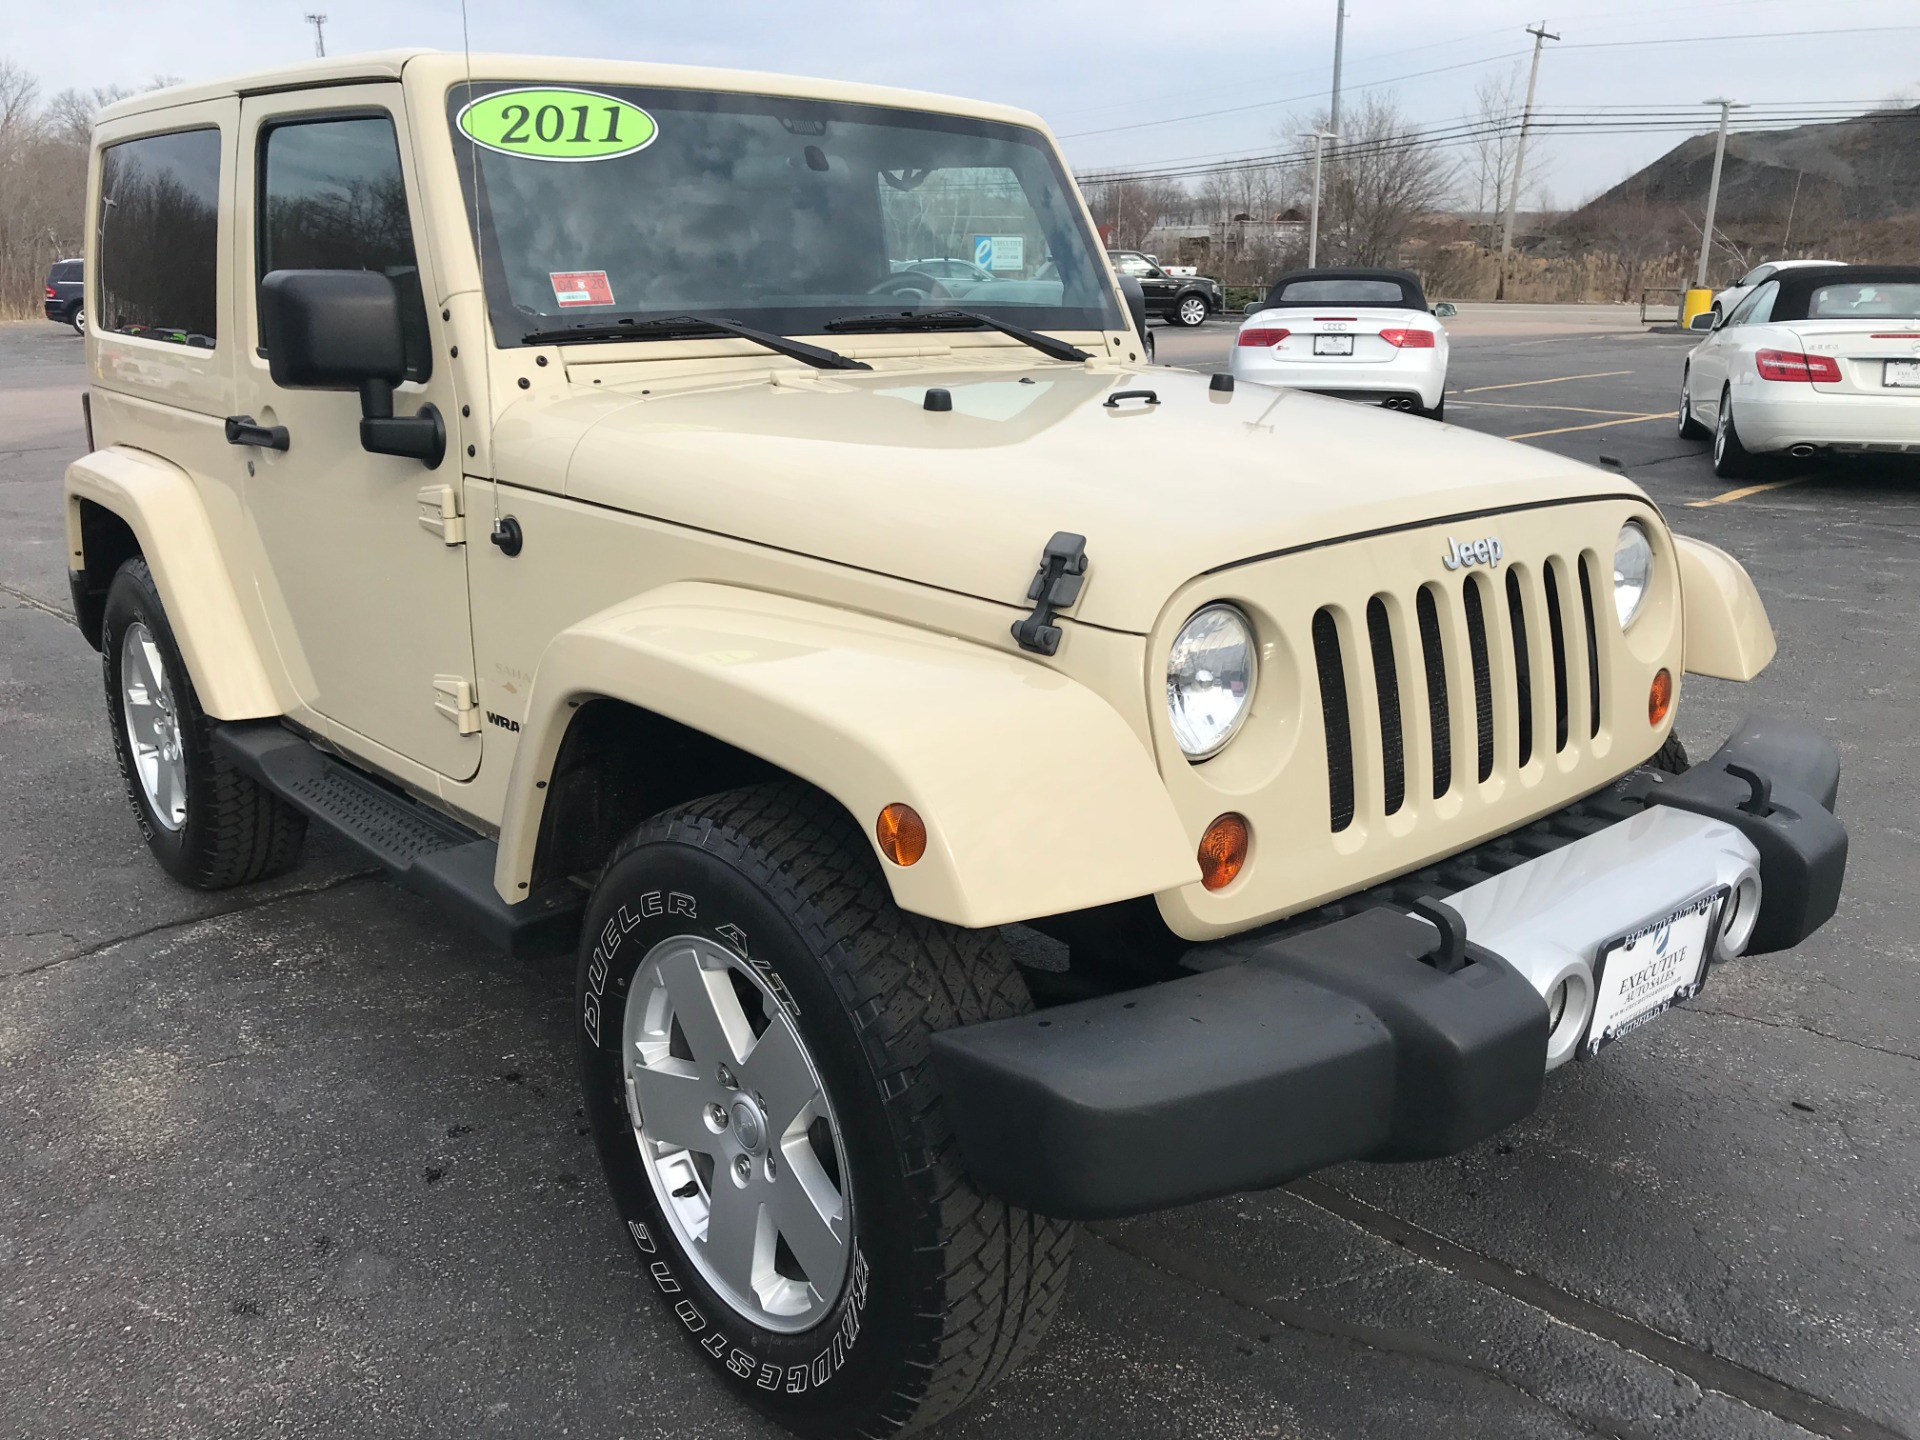 2011 jeep wrangler sahara stock 1571 for sale near smithfield ri ri jeep dealer. Black Bedroom Furniture Sets. Home Design Ideas